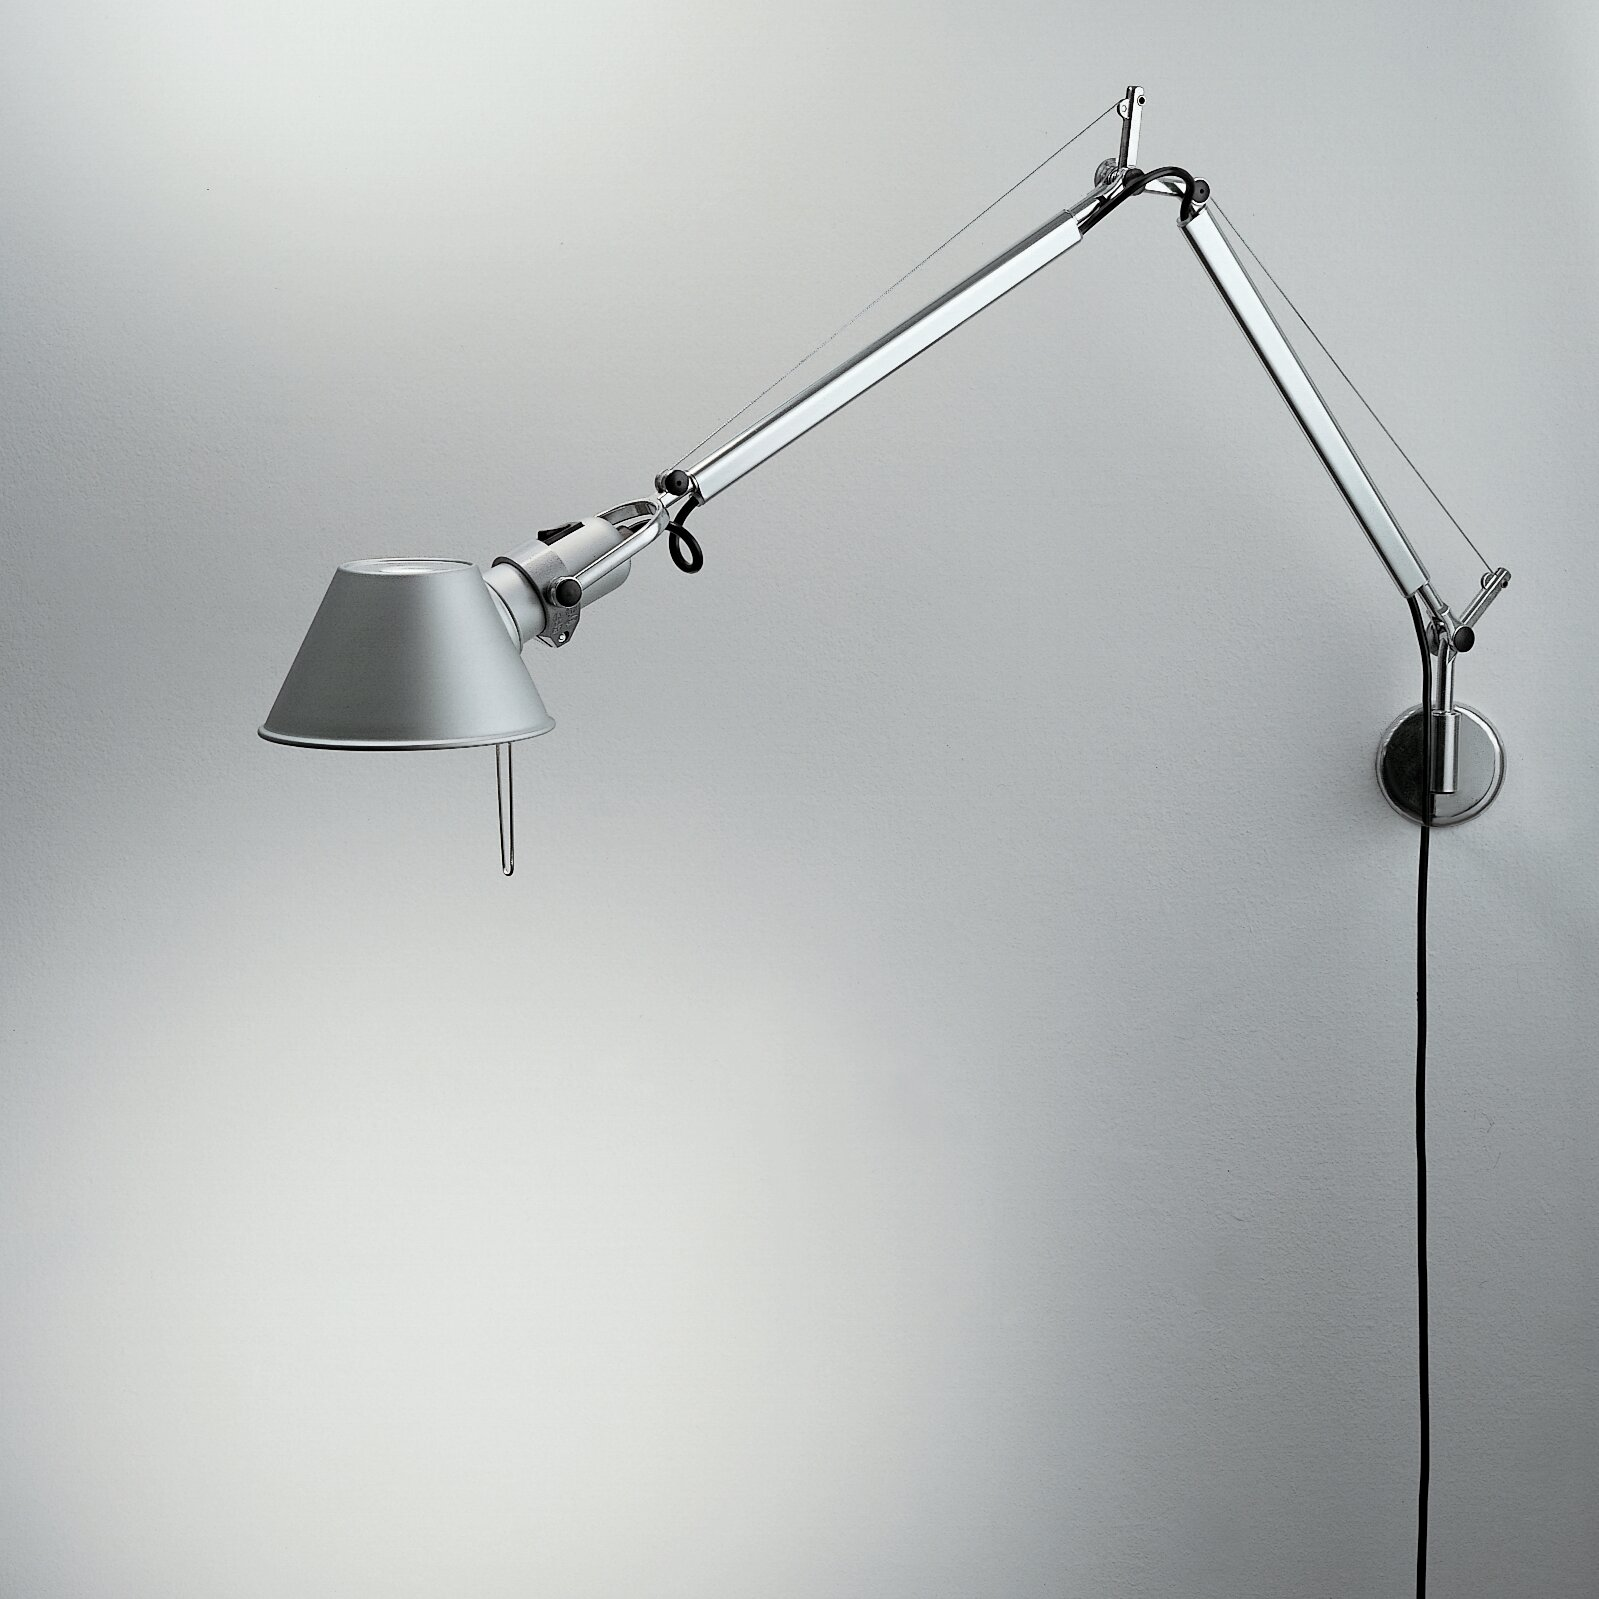 artemide tolomeo mini wall lamp reviews wayfair. Black Bedroom Furniture Sets. Home Design Ideas